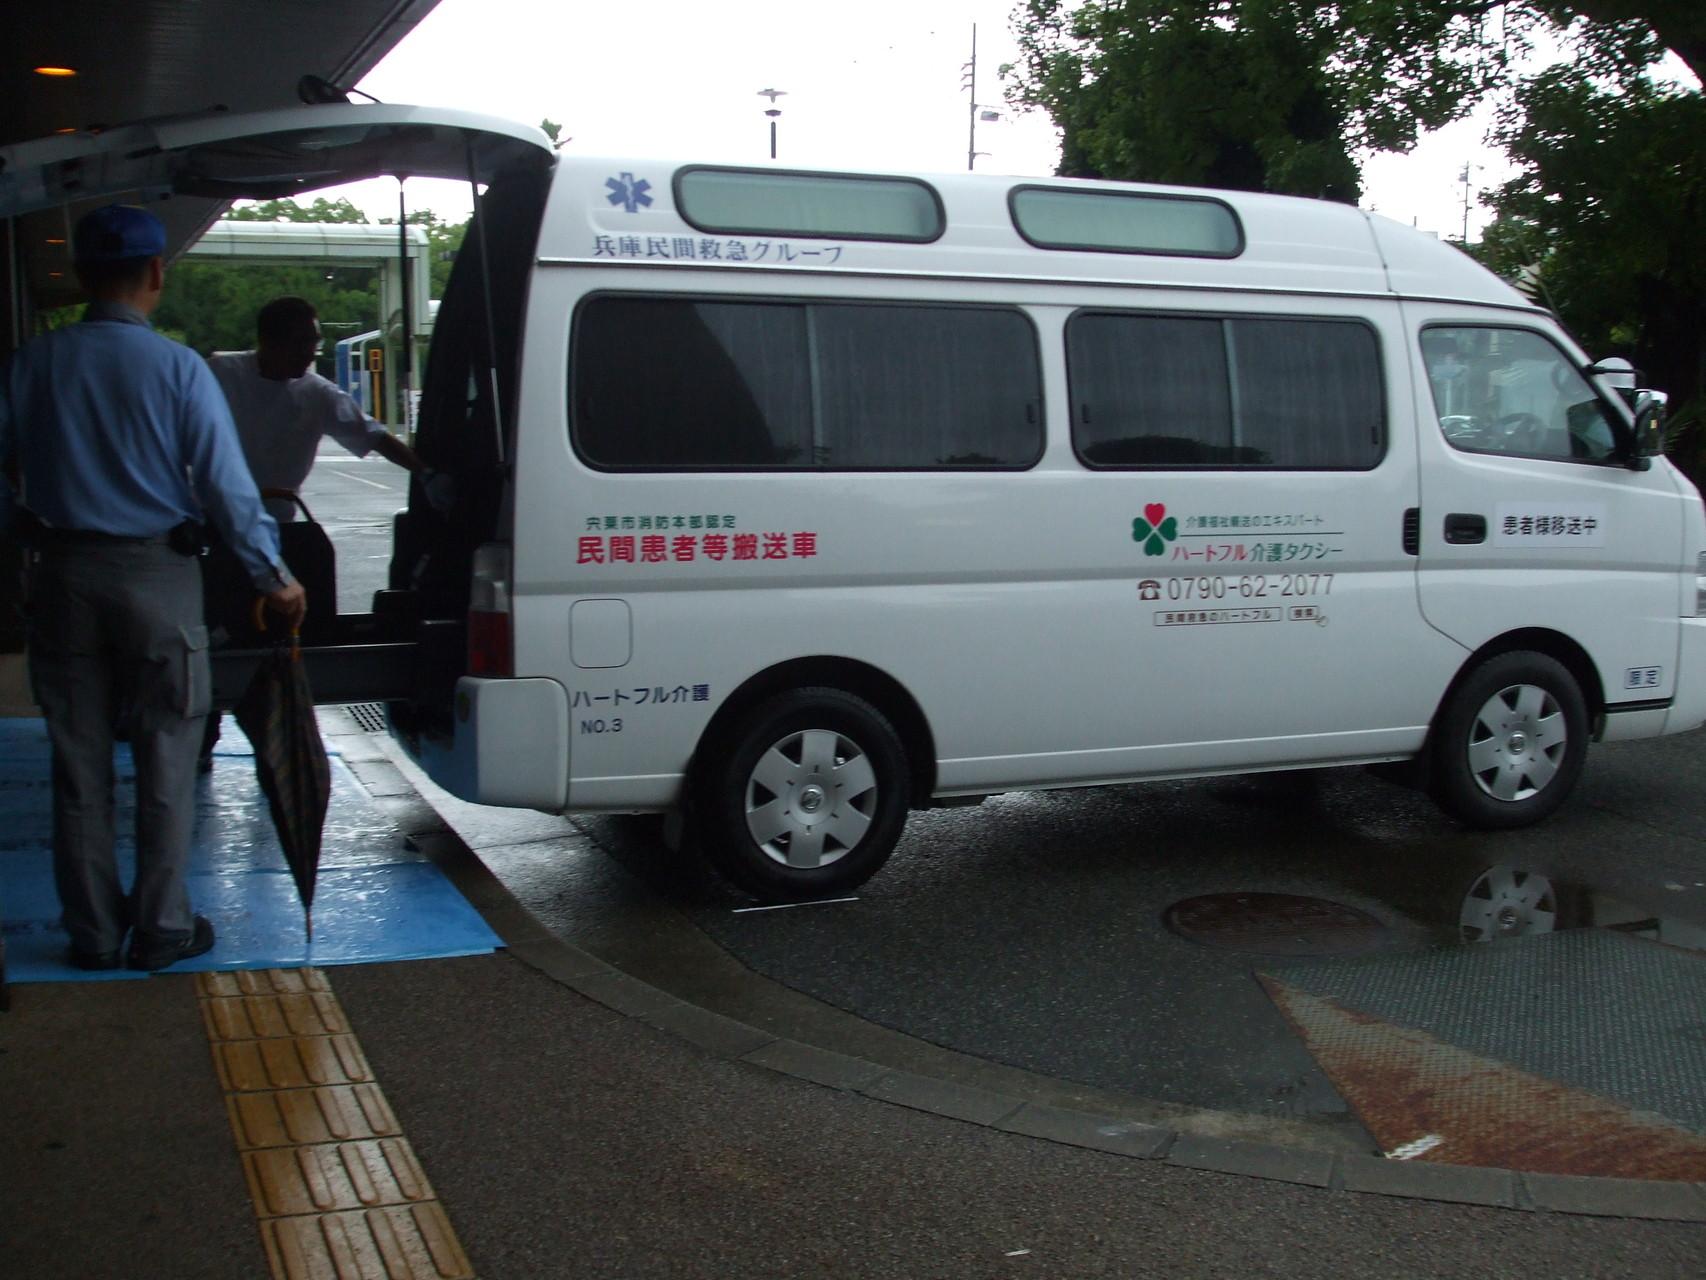 兵庫県立尼崎病院で弊社車両に患者様が乗車中